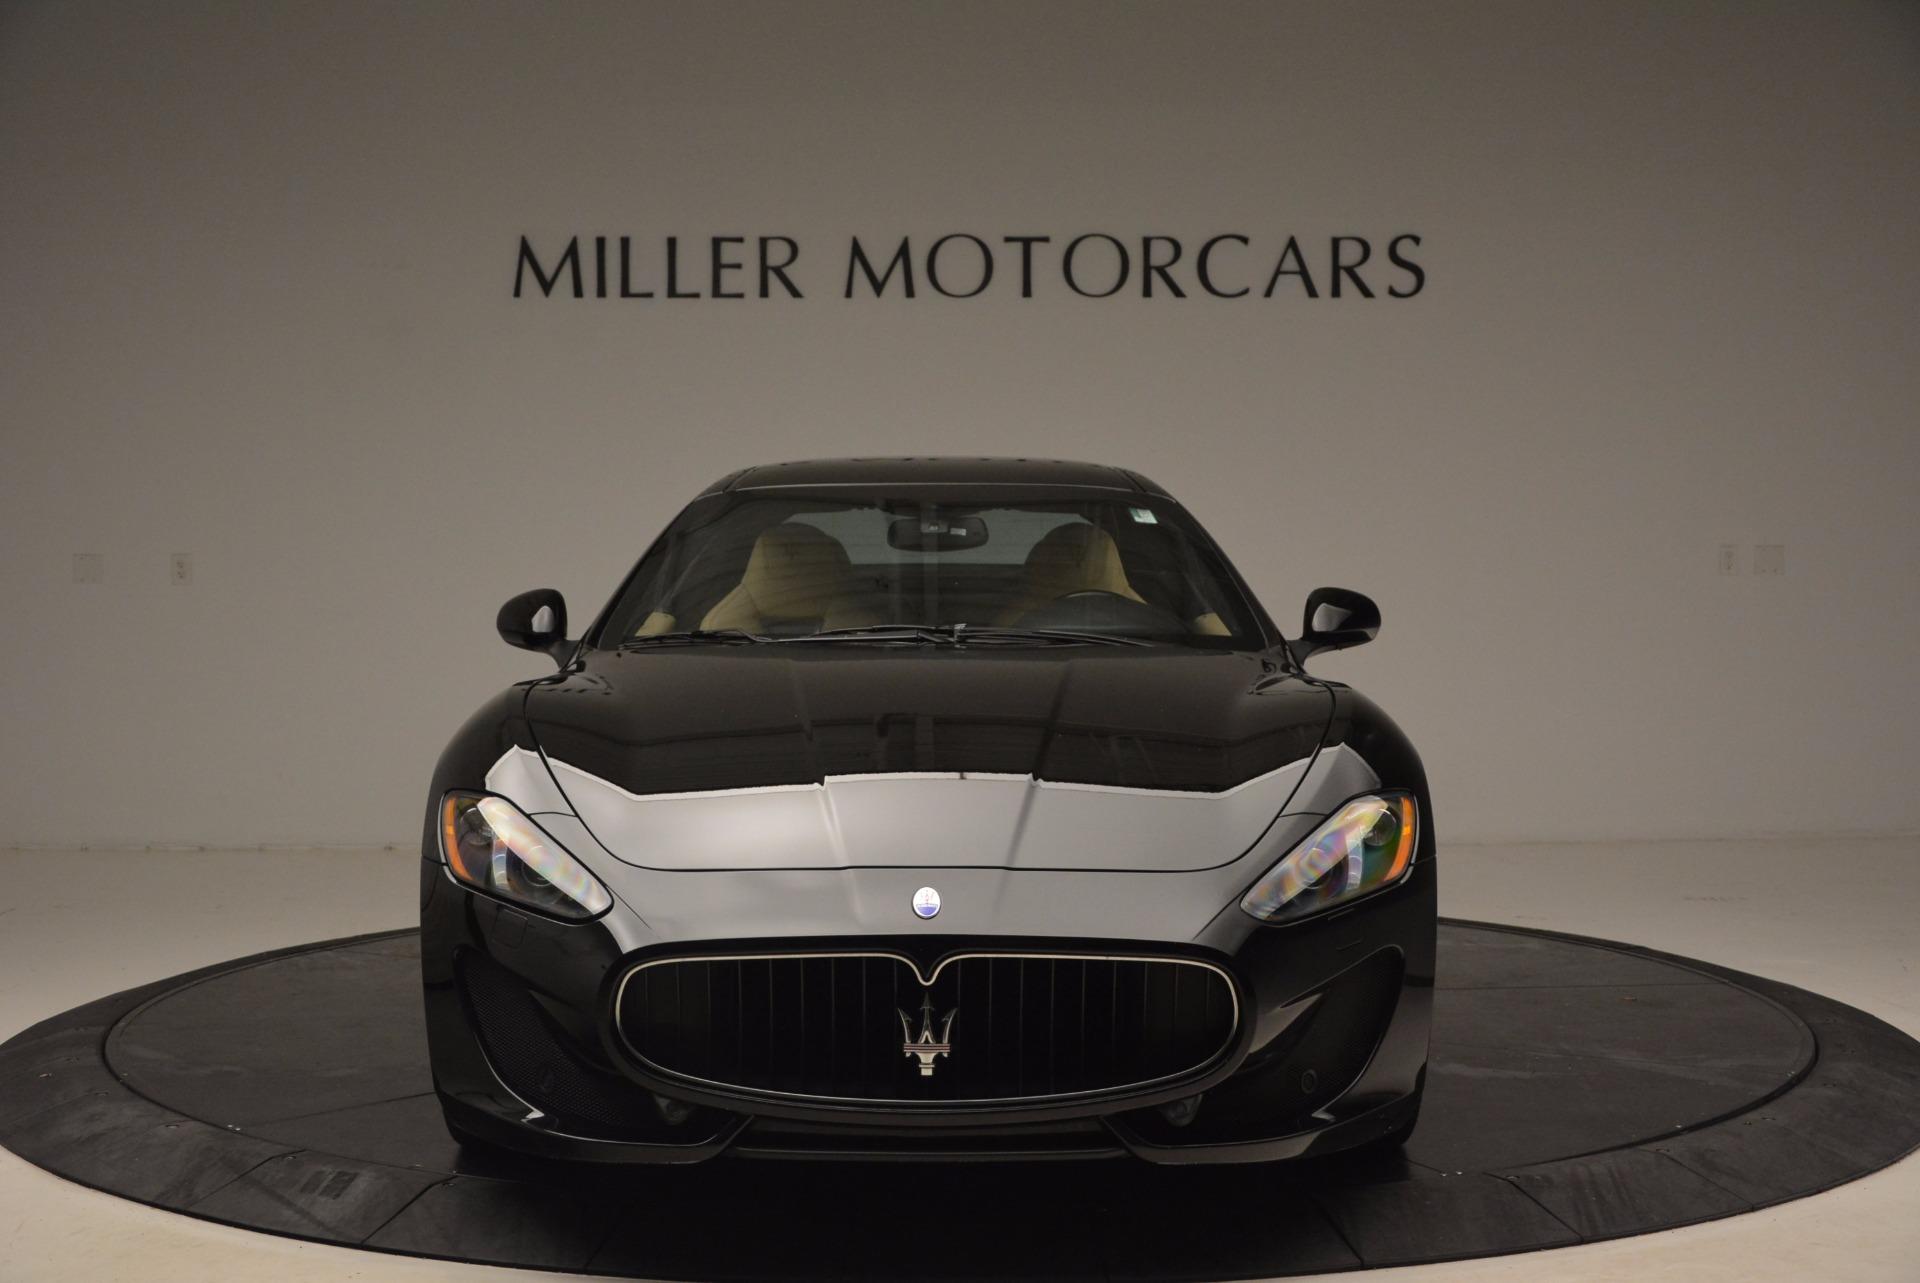 Used 2015 Maserati GranTurismo Sport Coupe For Sale In Westport, CT 1557_p12